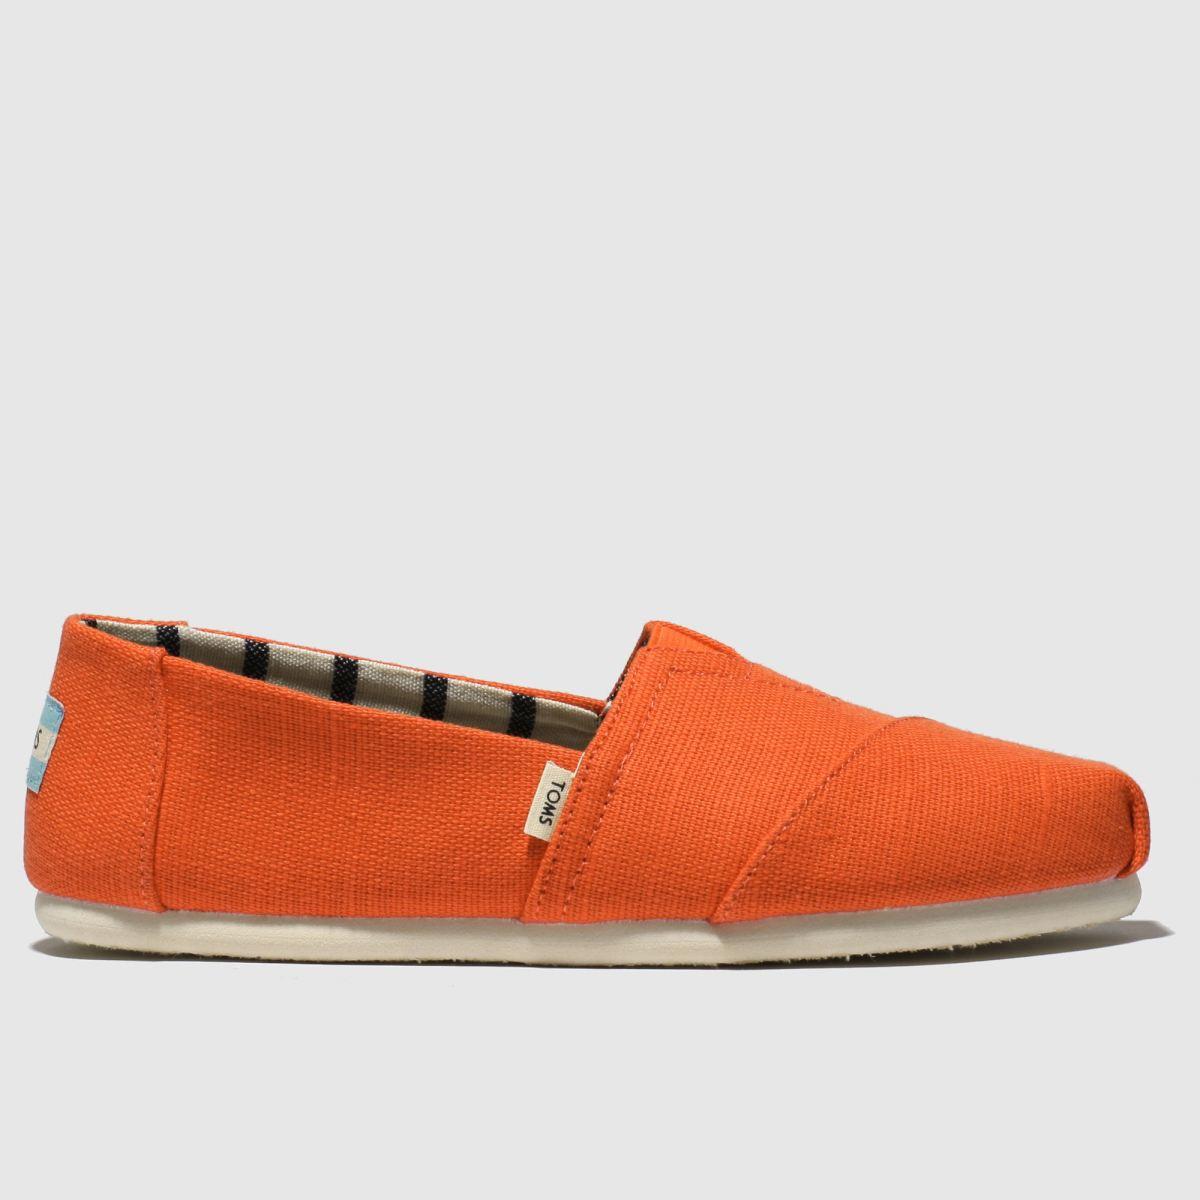 Toms Orange Alpargata Flat Shoes